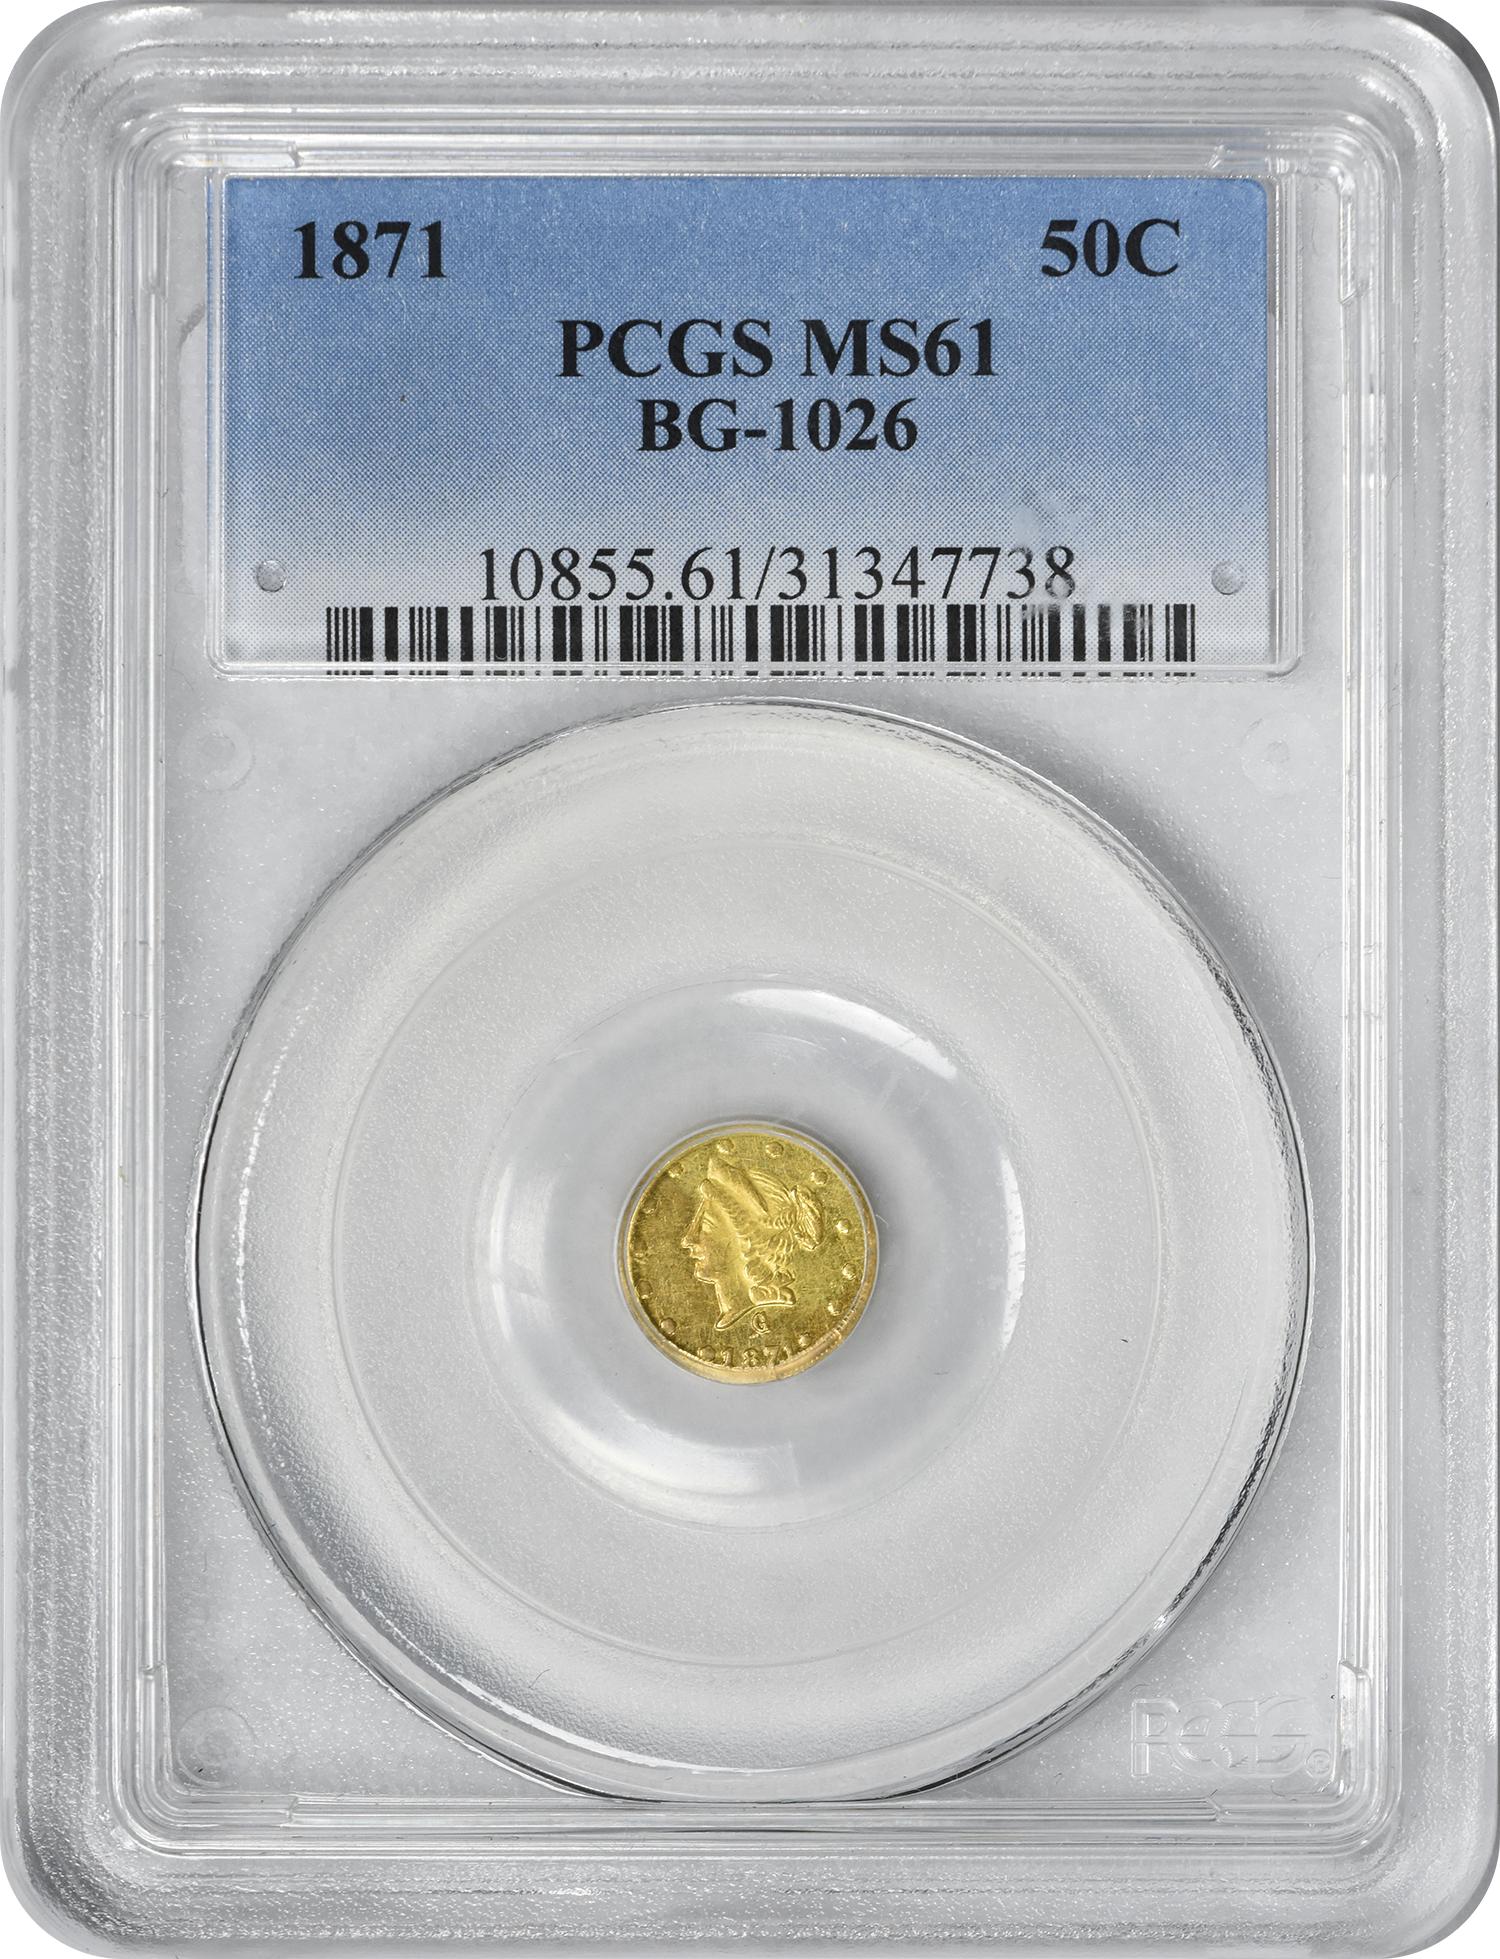 1871 Half Dollar California Gold, BG-1026, MS61, PCGS